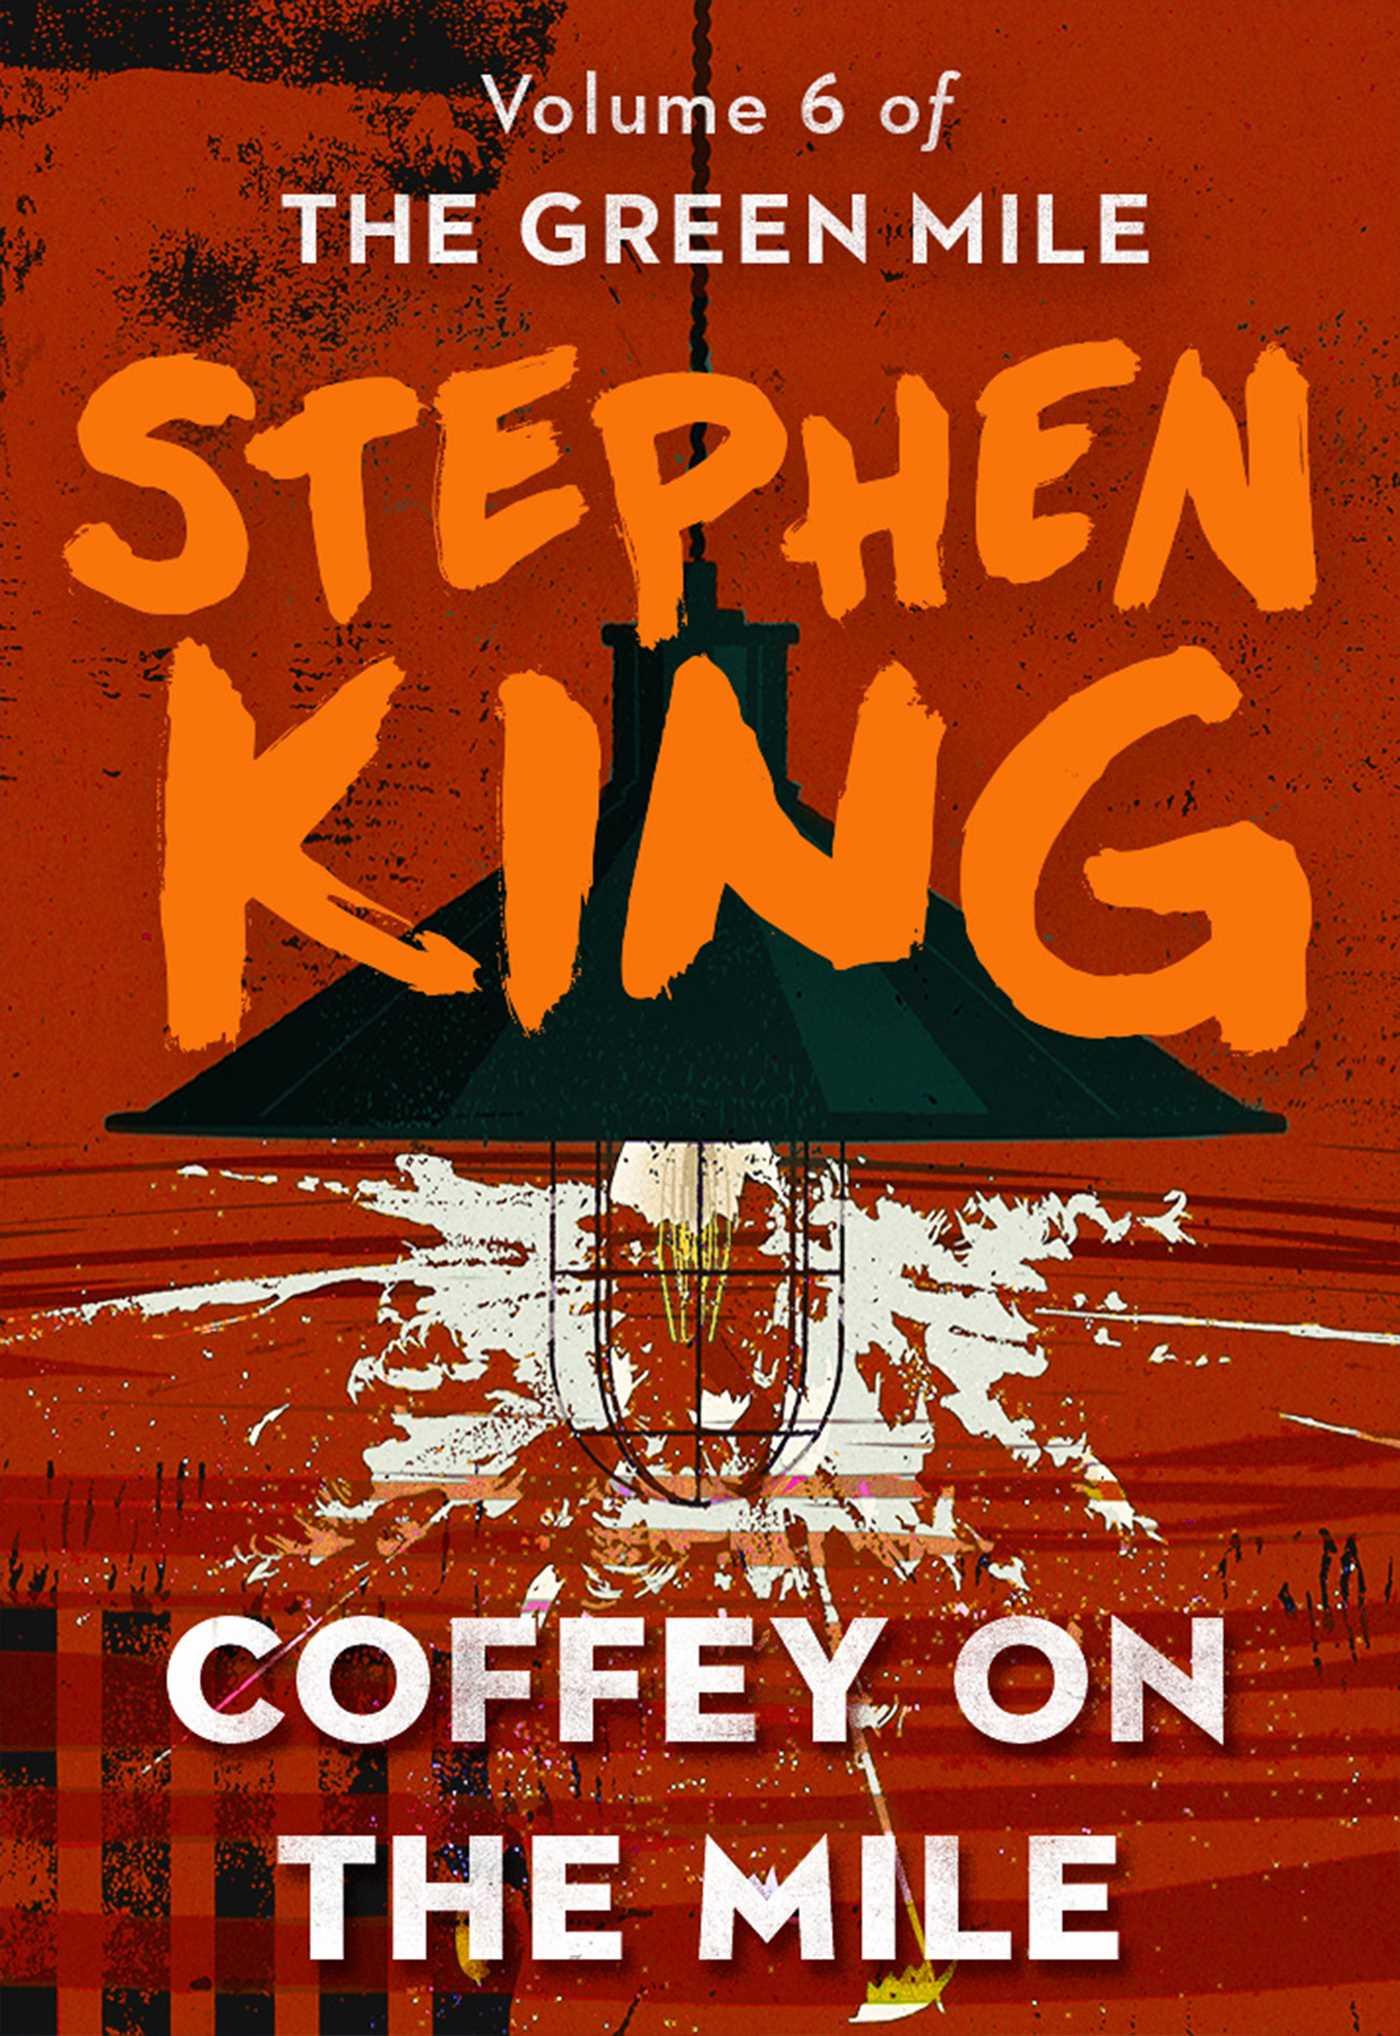 Coffey on the Mile